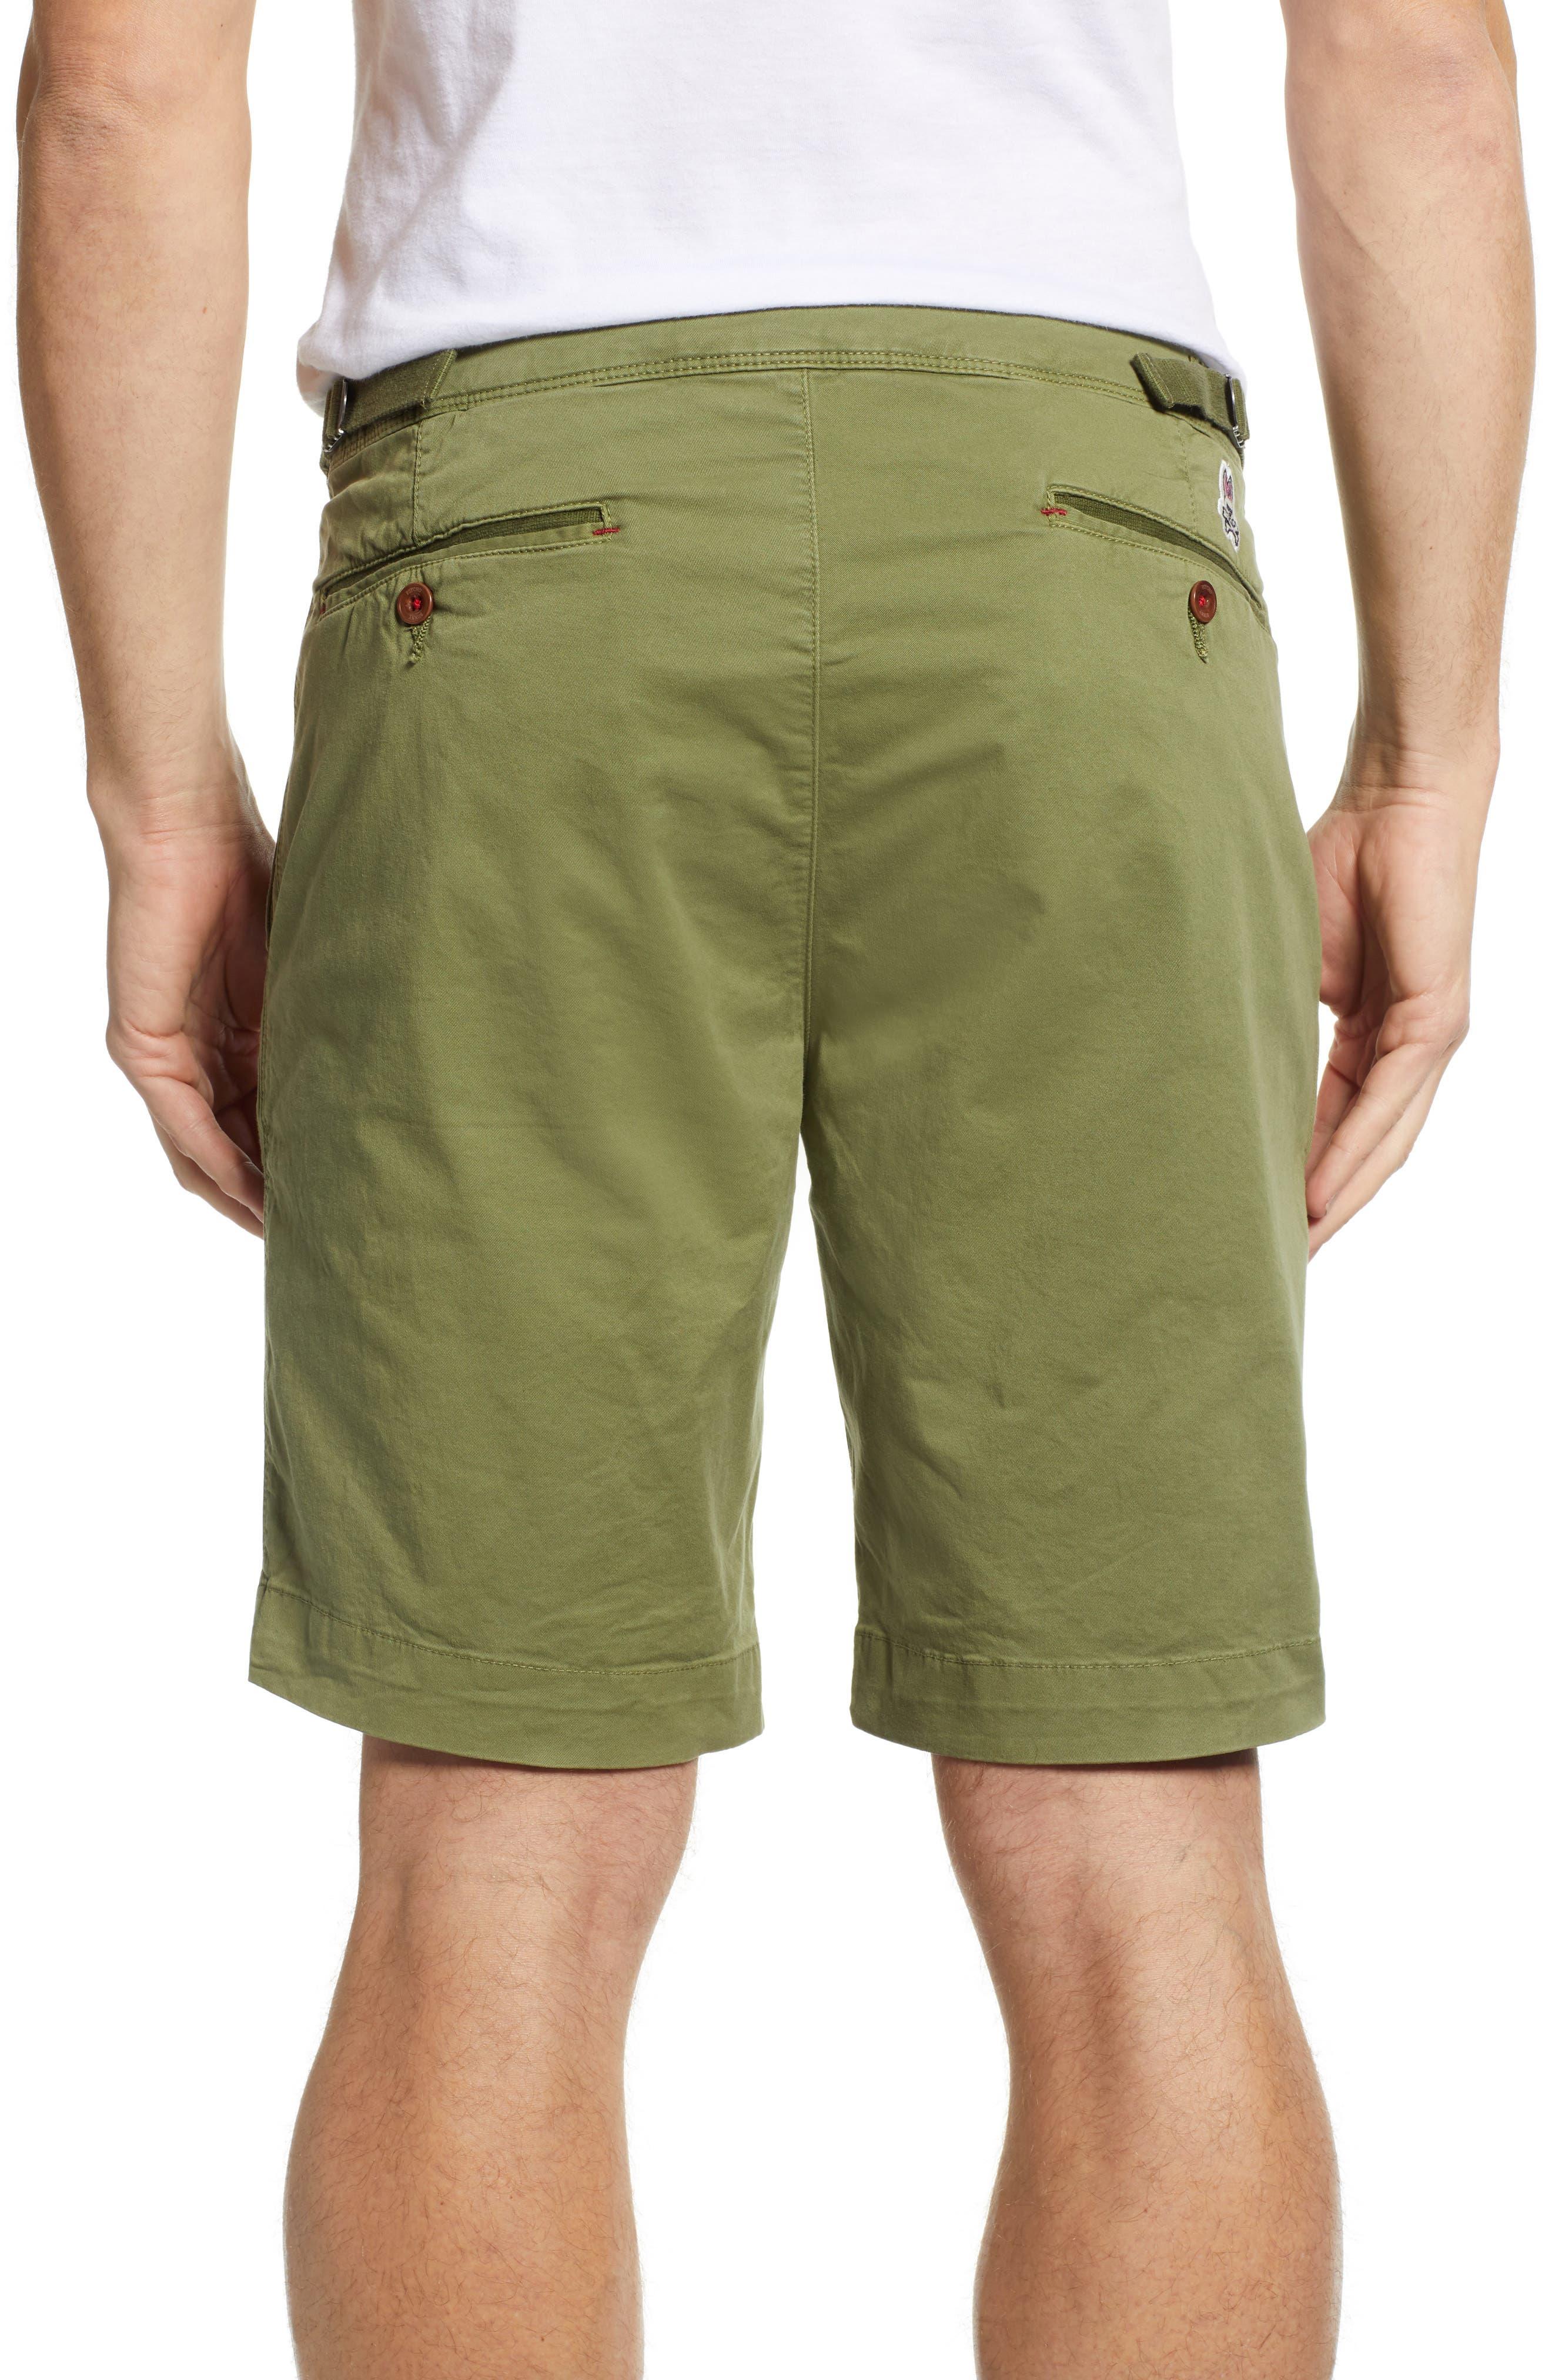 Triumph Shorts,                             Alternate thumbnail 2, color,                             OLIVINE